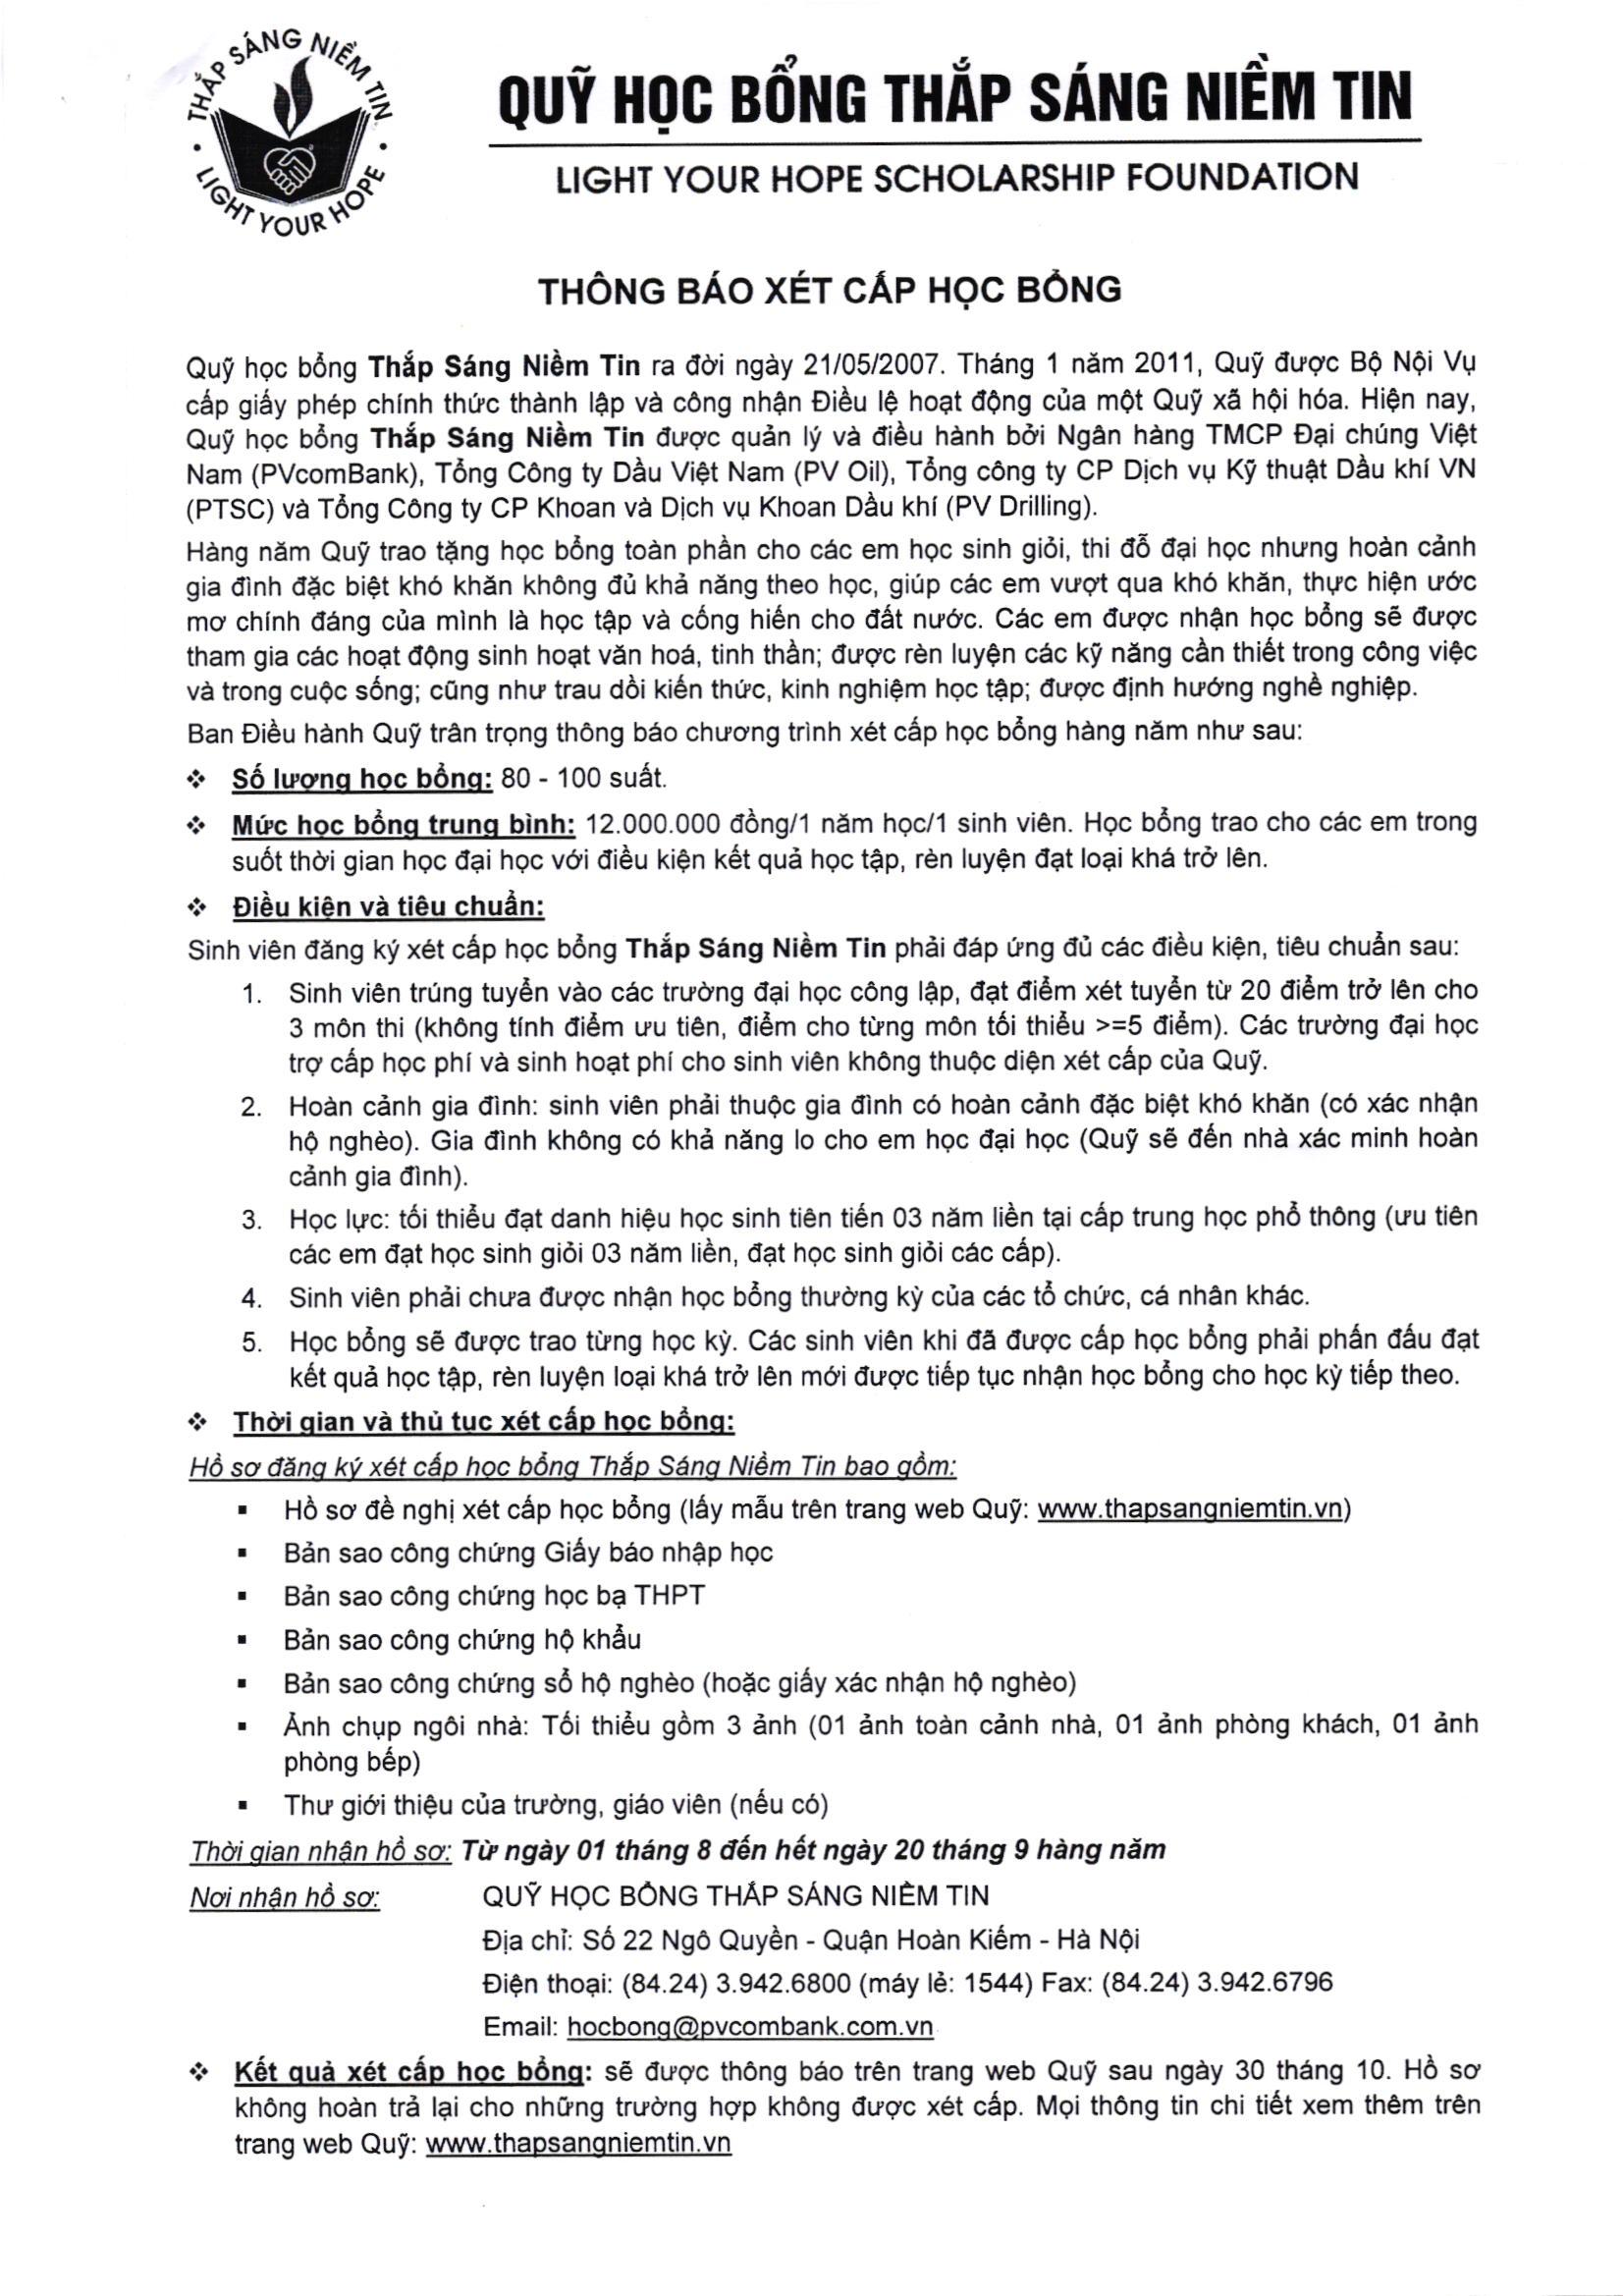 29.18-Hoc bong 2018-Quy hoc bong thap sang niem tin_Page_4